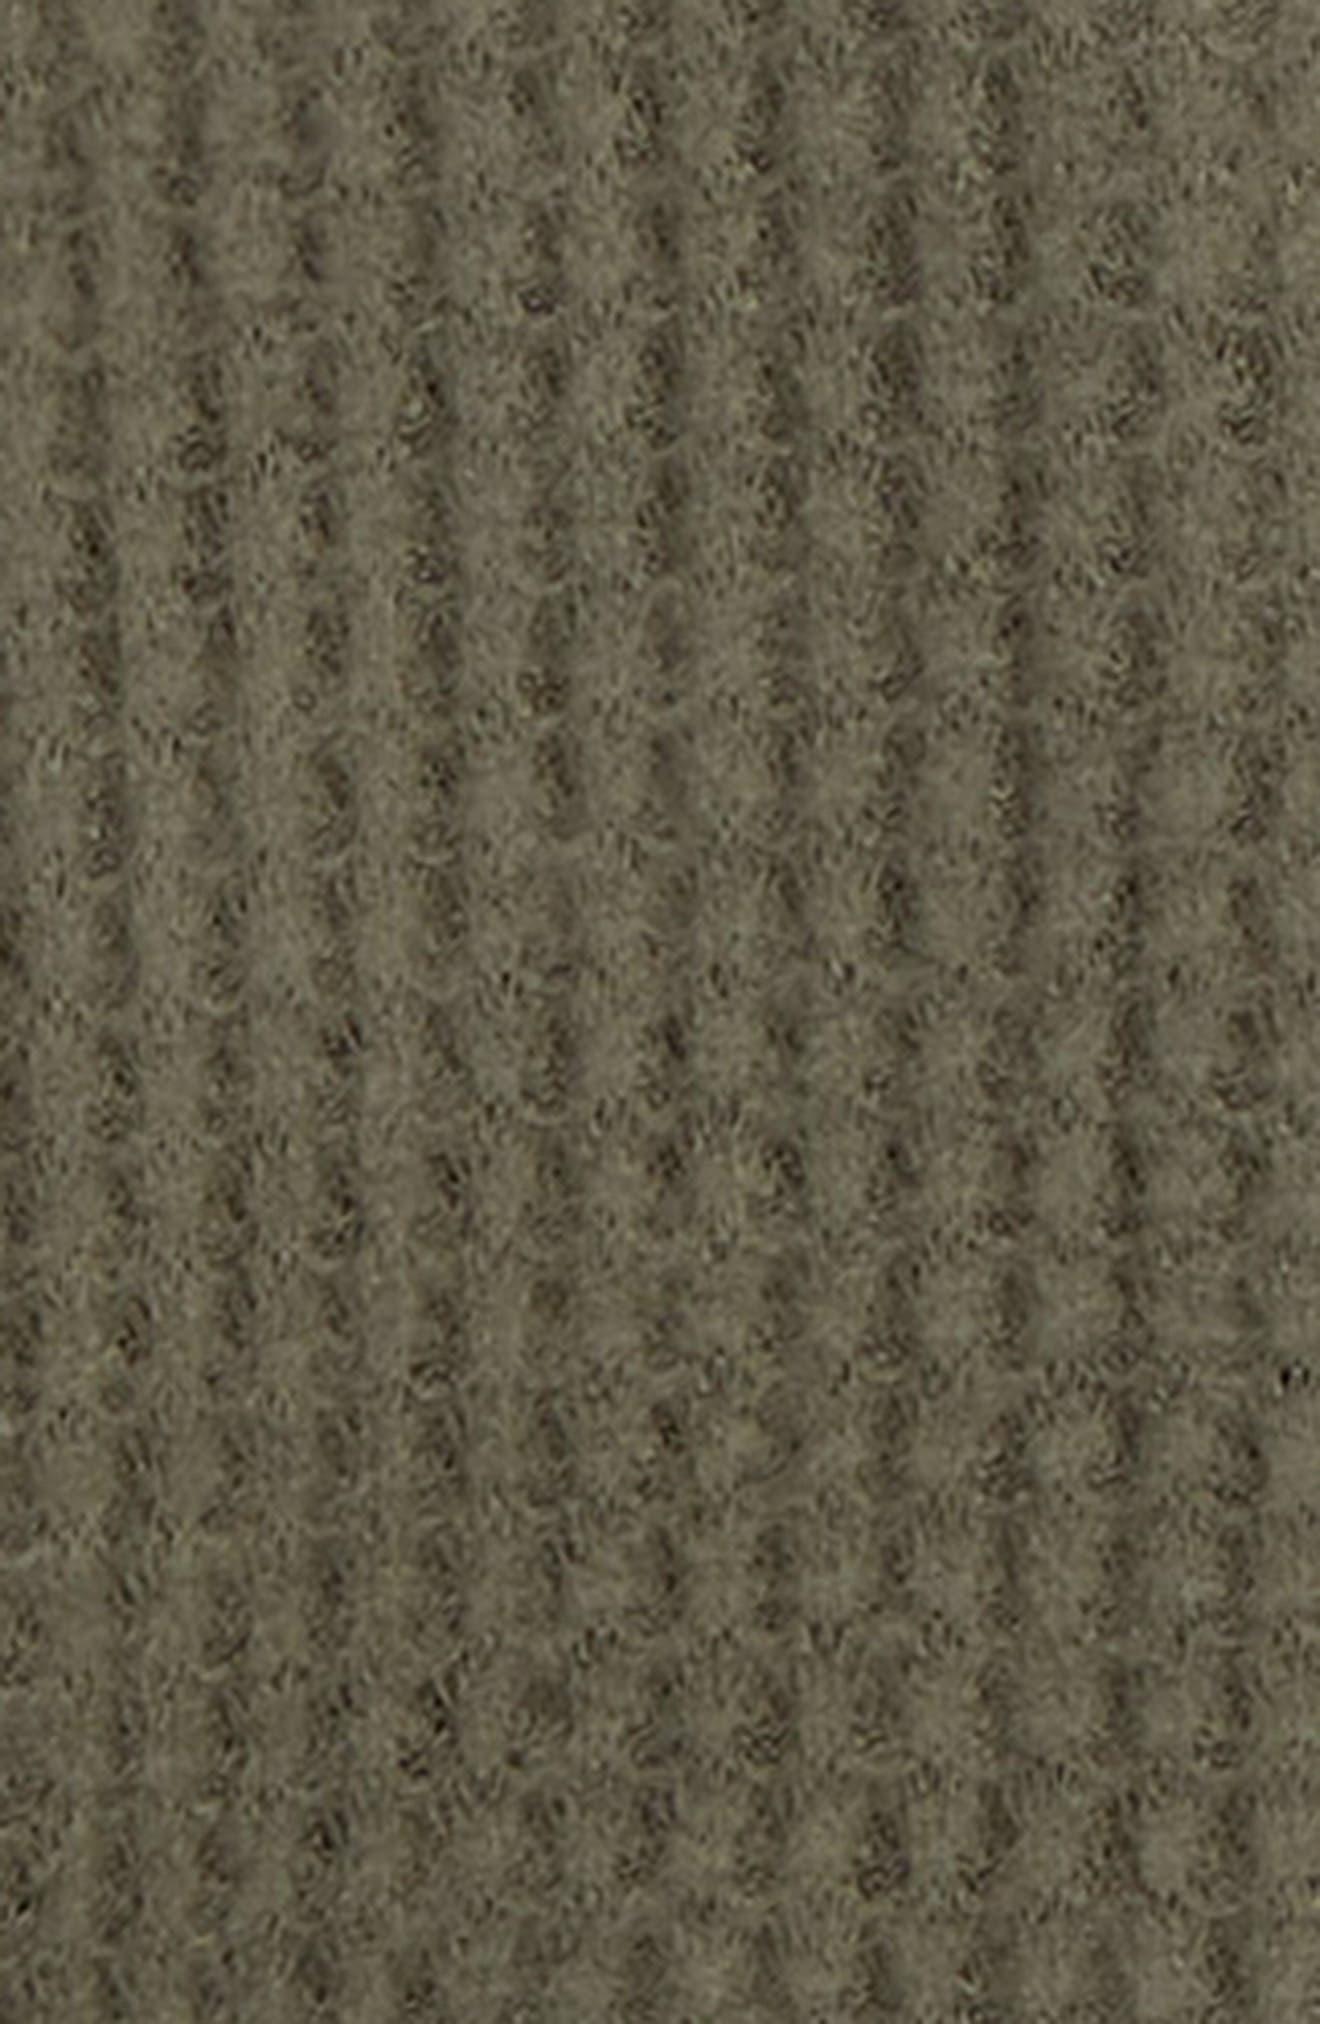 Dolman Sleeve Pullover,                             Alternate thumbnail 3, color,                             OLIVE